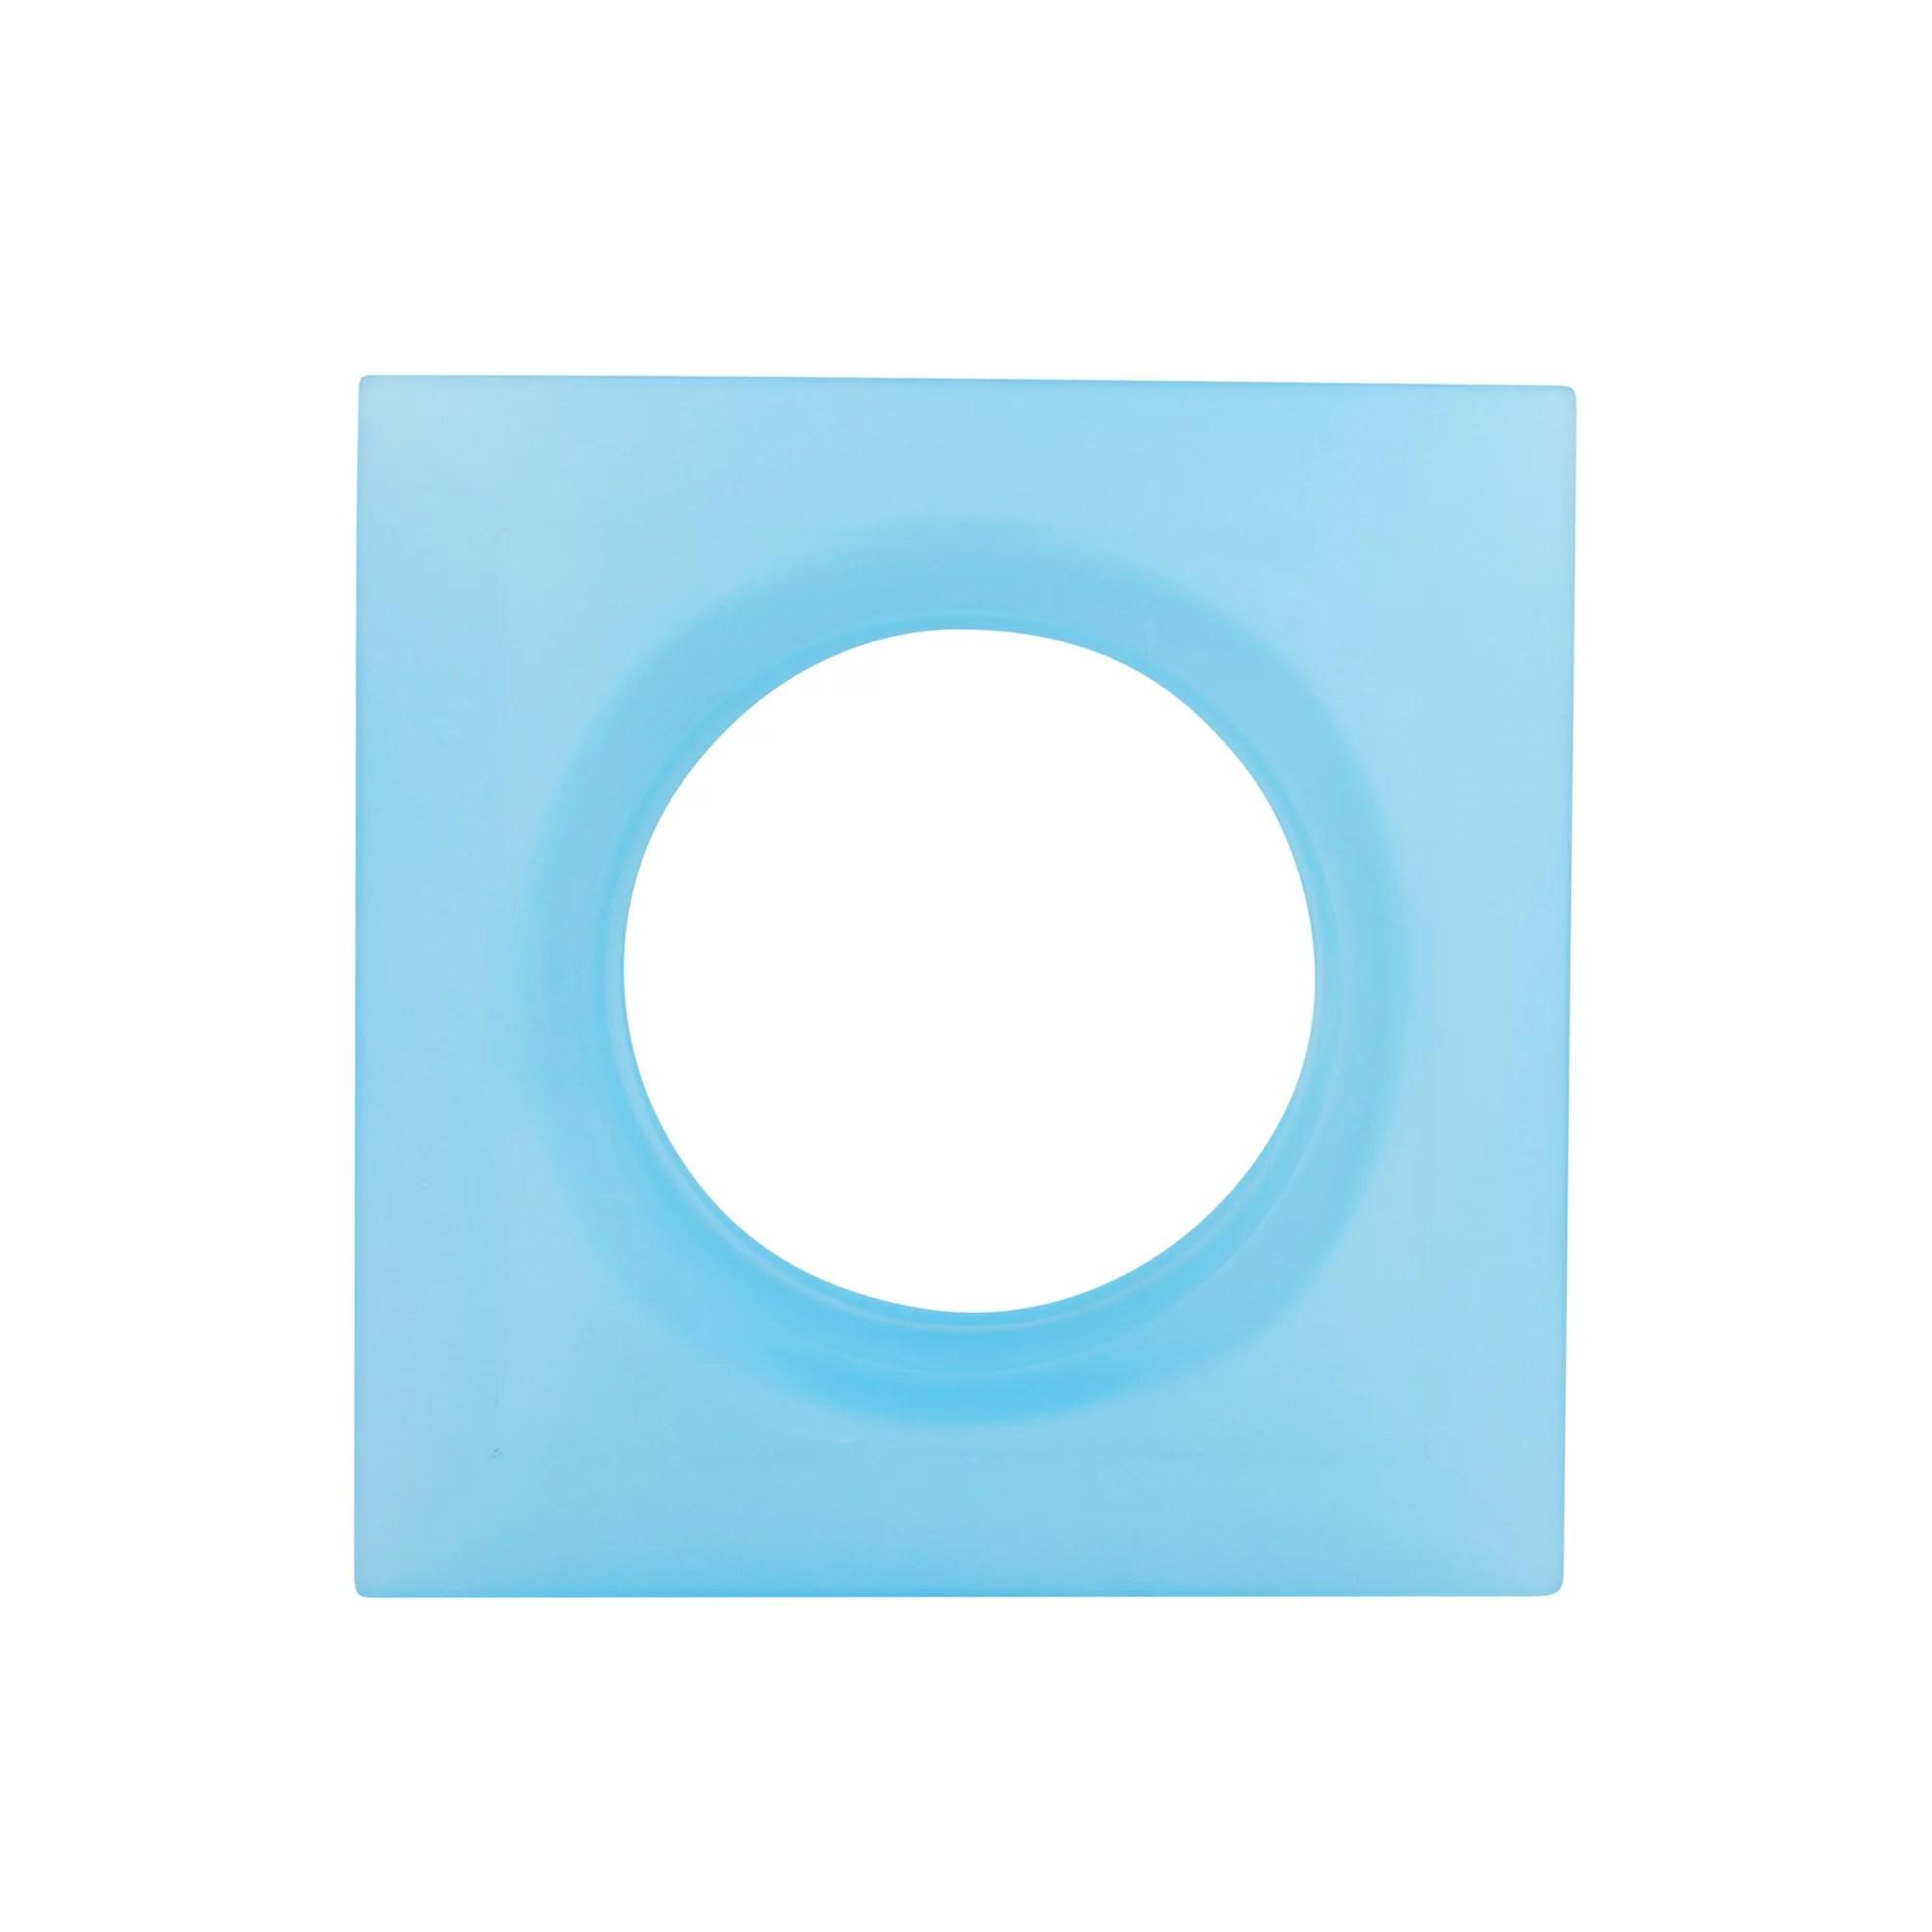 leucos lighting mira 2 glass square recessed lighting trim light blue glass